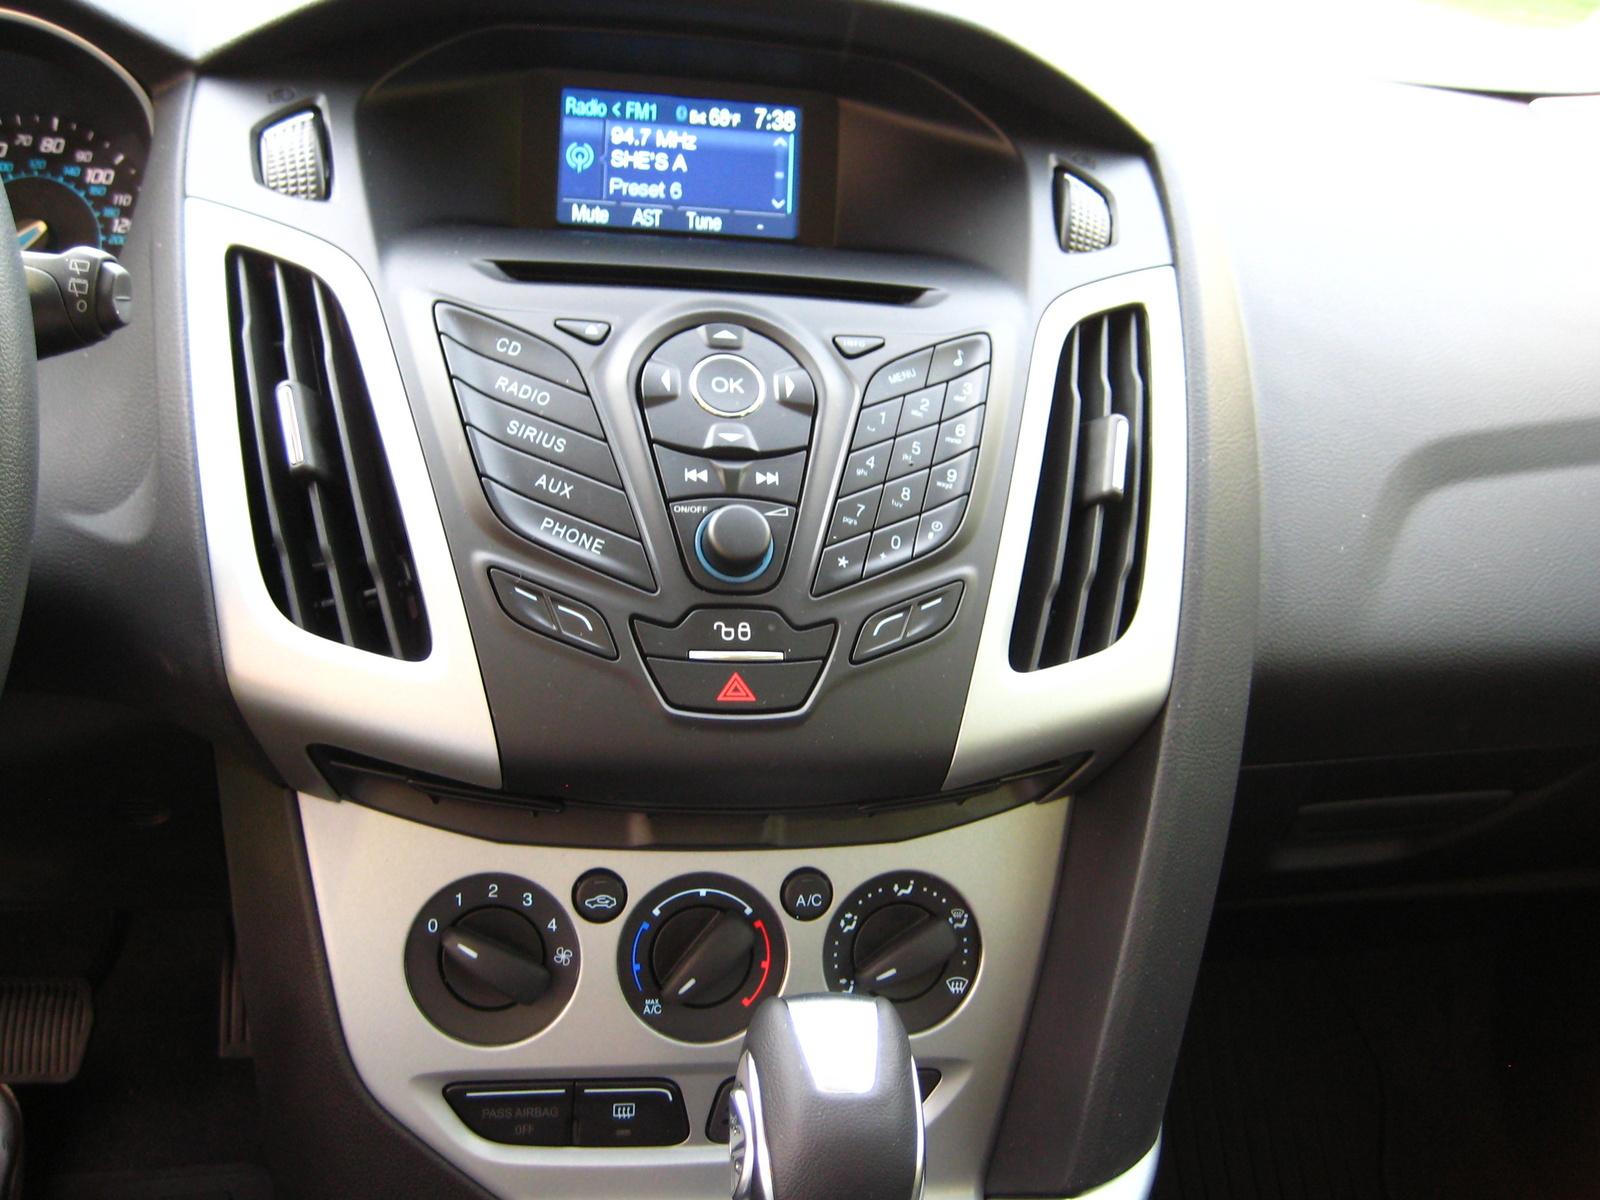 picture of 2012 ford focus se hatchback interior - Ford Focus 2012 Hatchback Interior